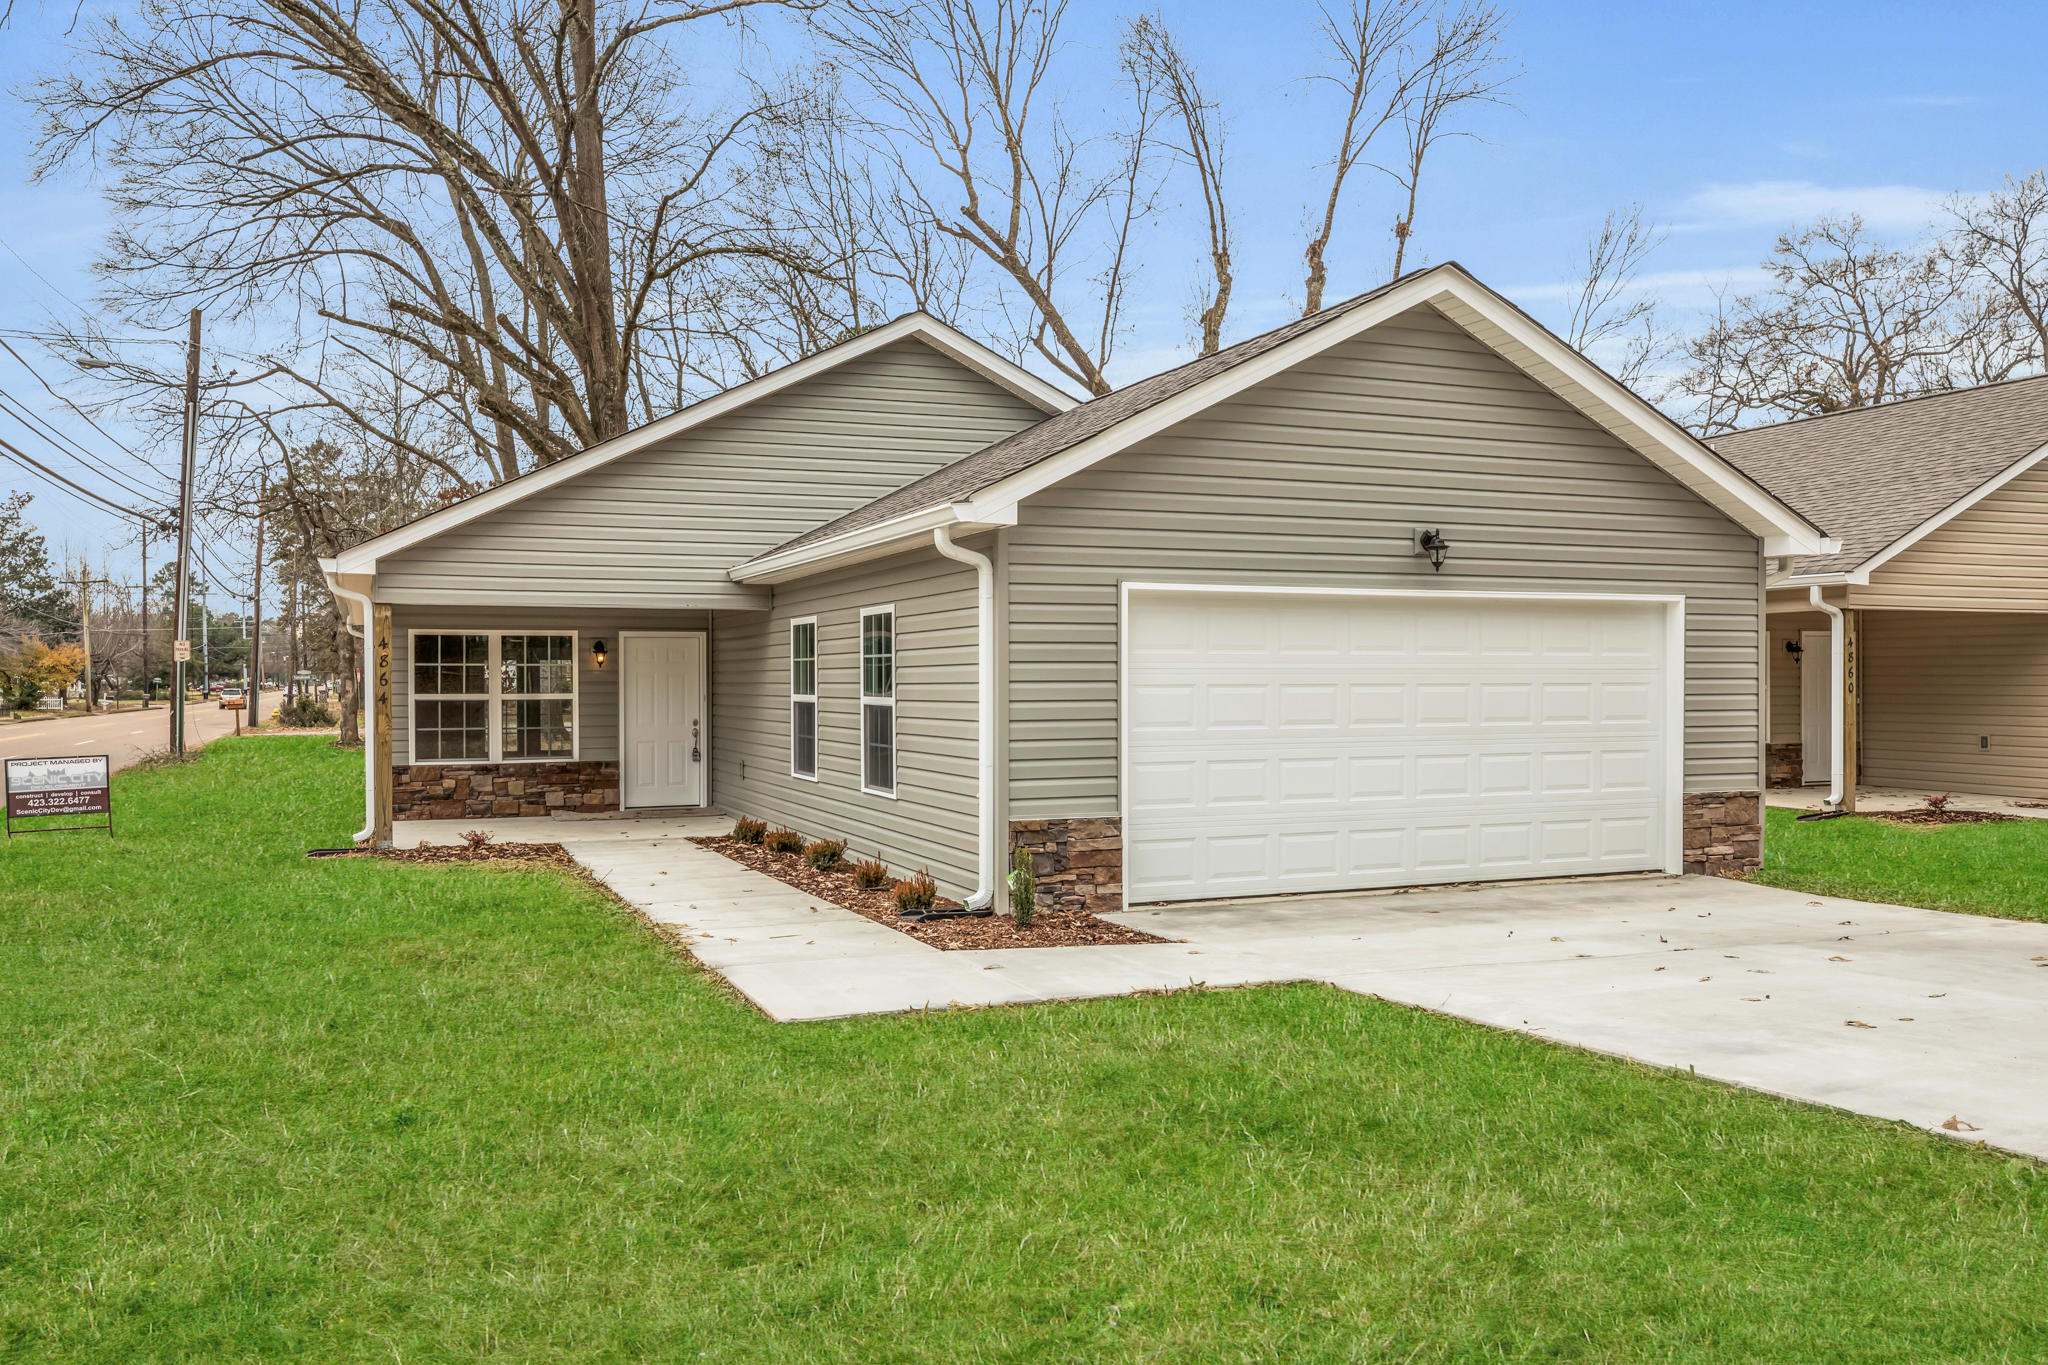 4864 Pawnee Tr, Chattanooga, TN 37411